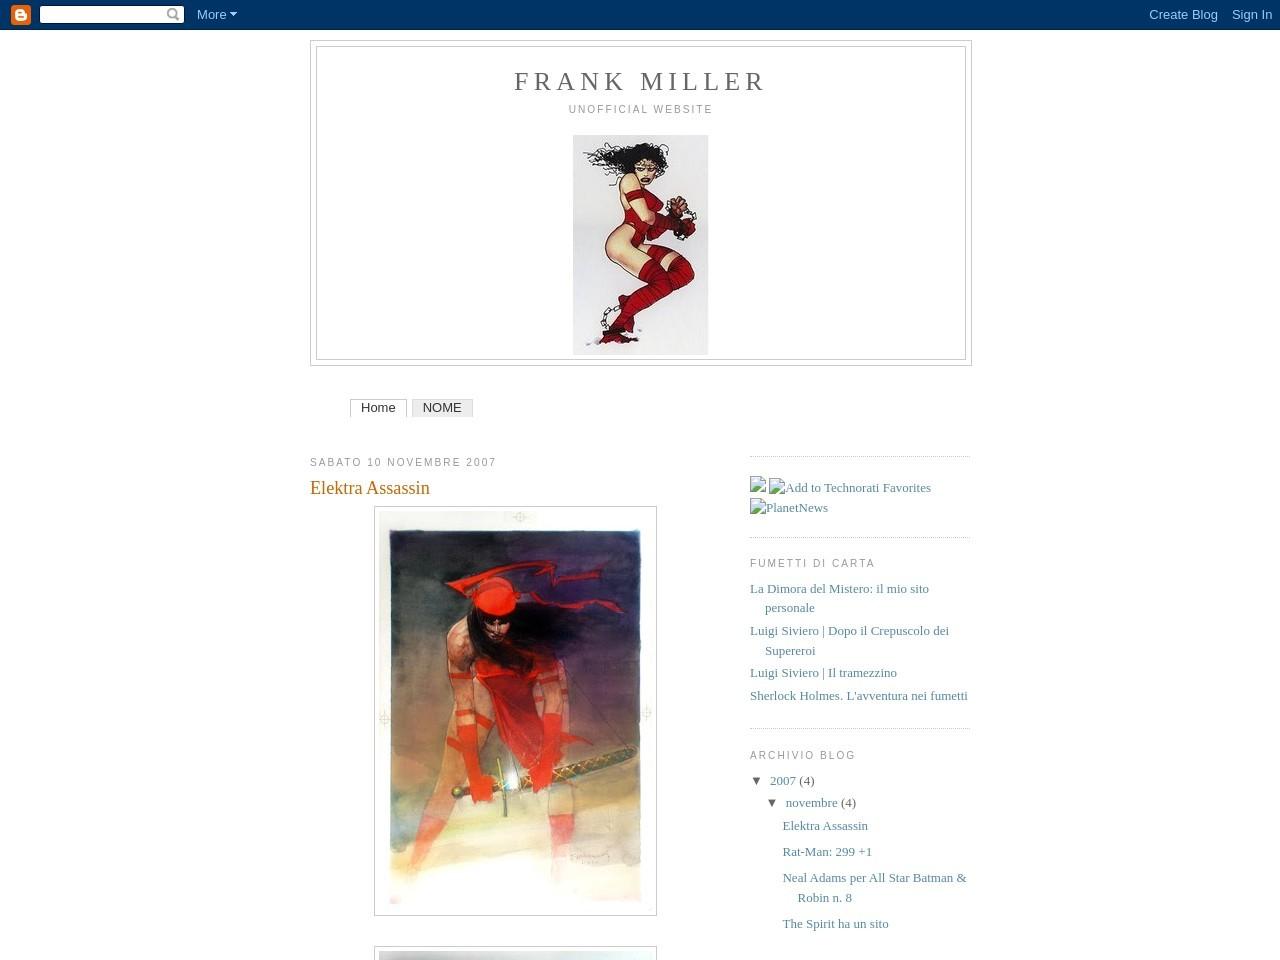 frank-miller-unofficial-website